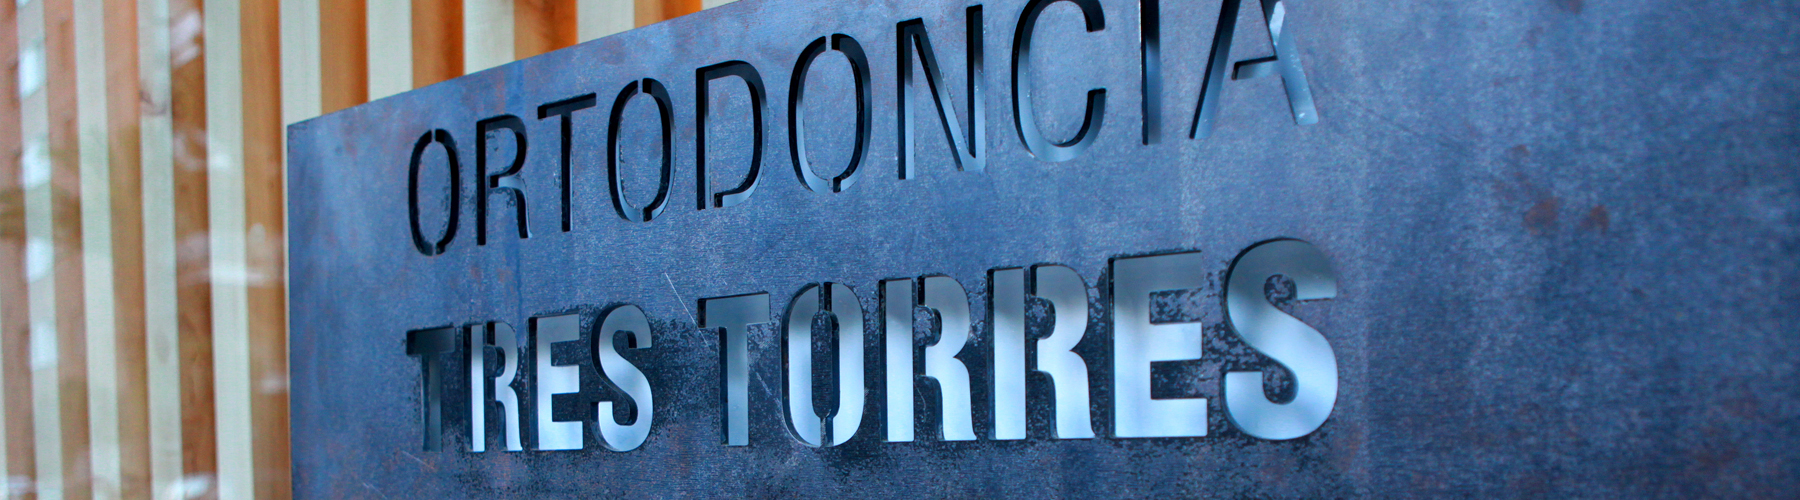 Ortodoncia Tres Torres Barcelona clínica entrada